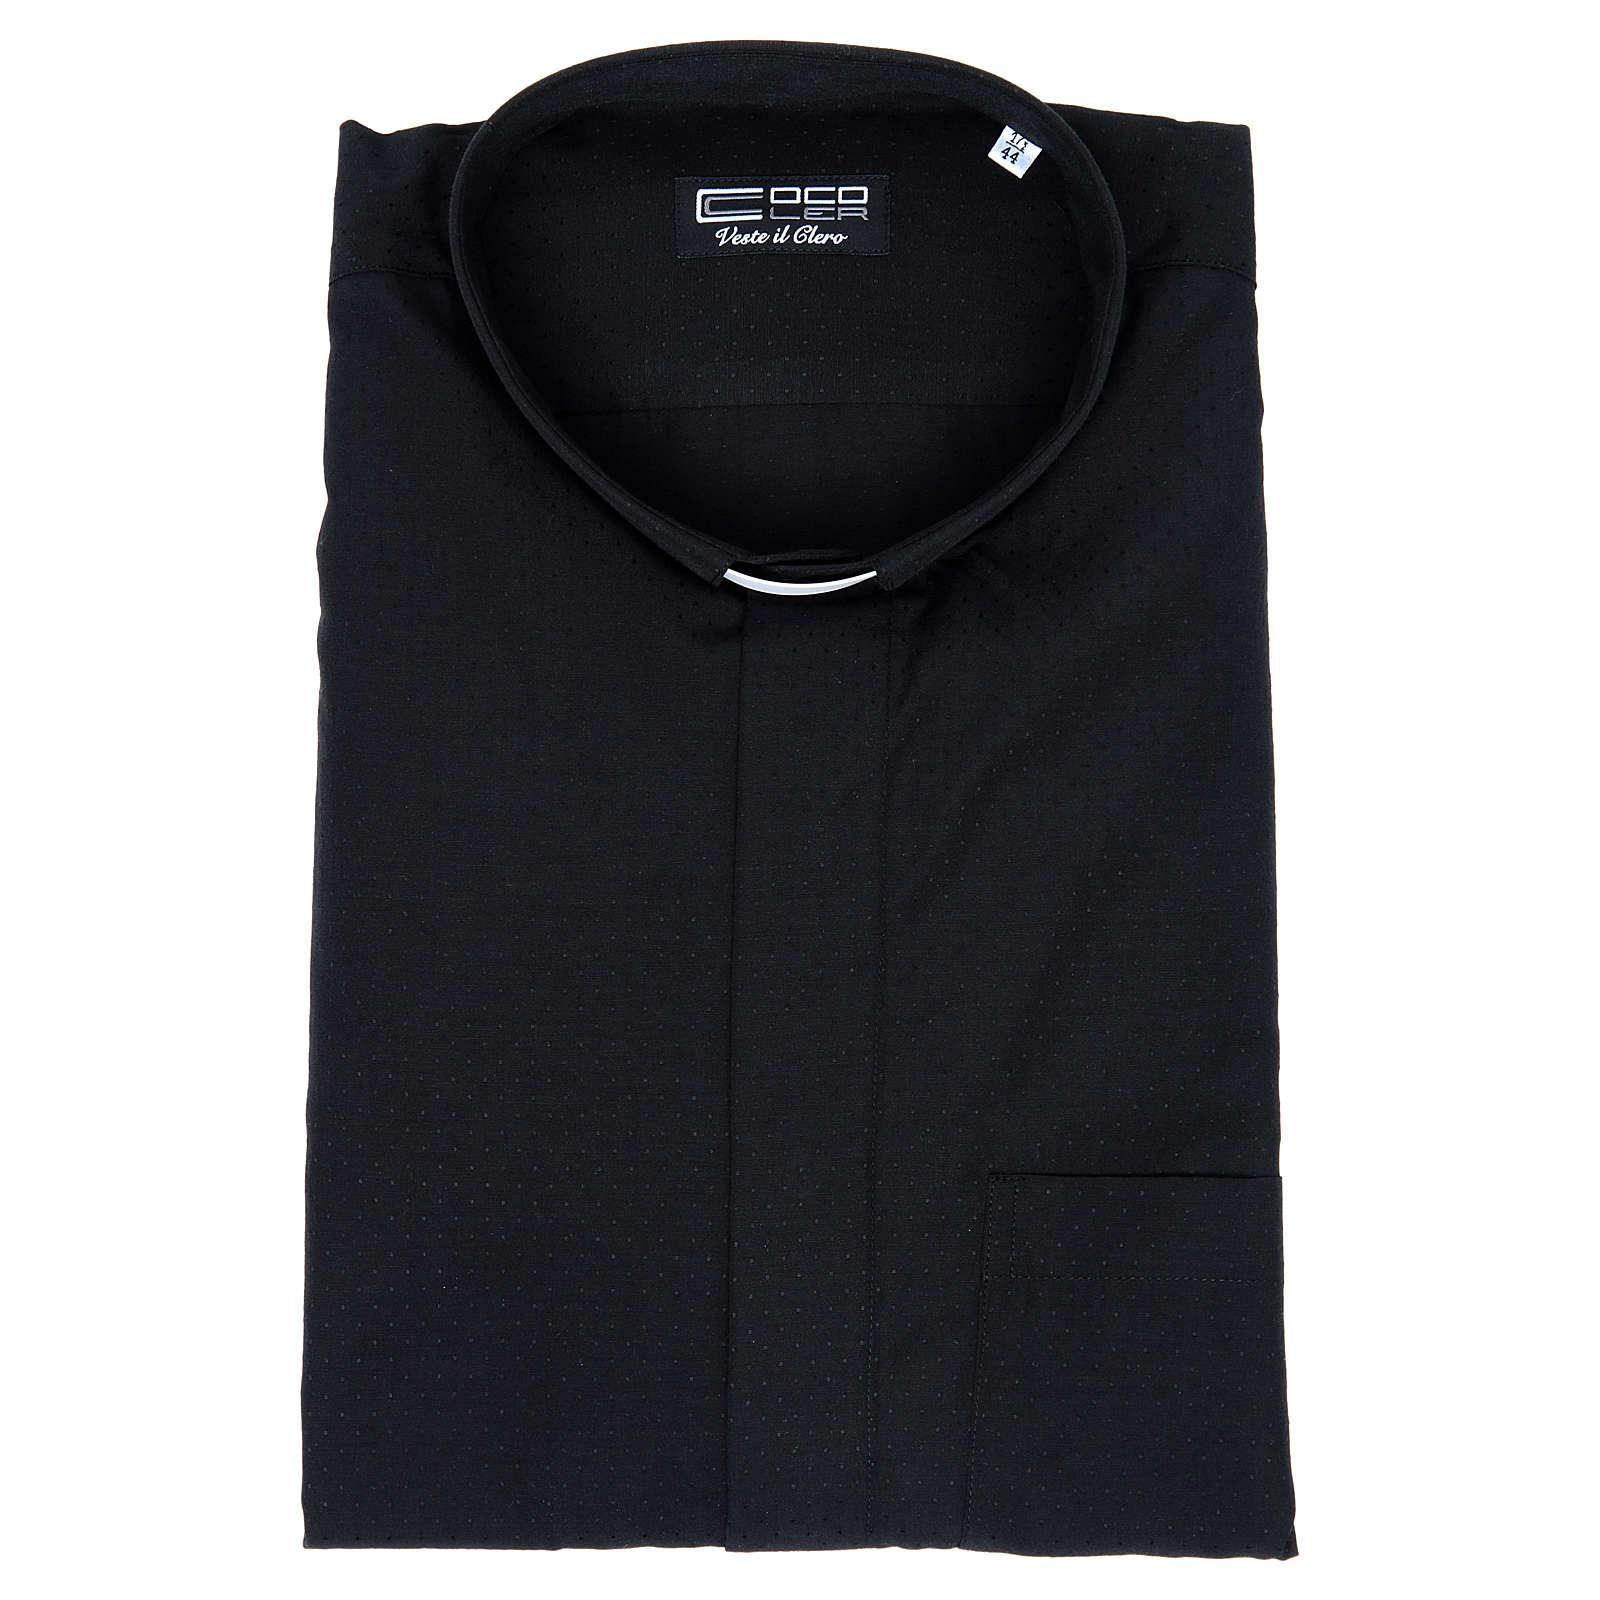 Chemise clergy coton polyester noir manches courtes 4